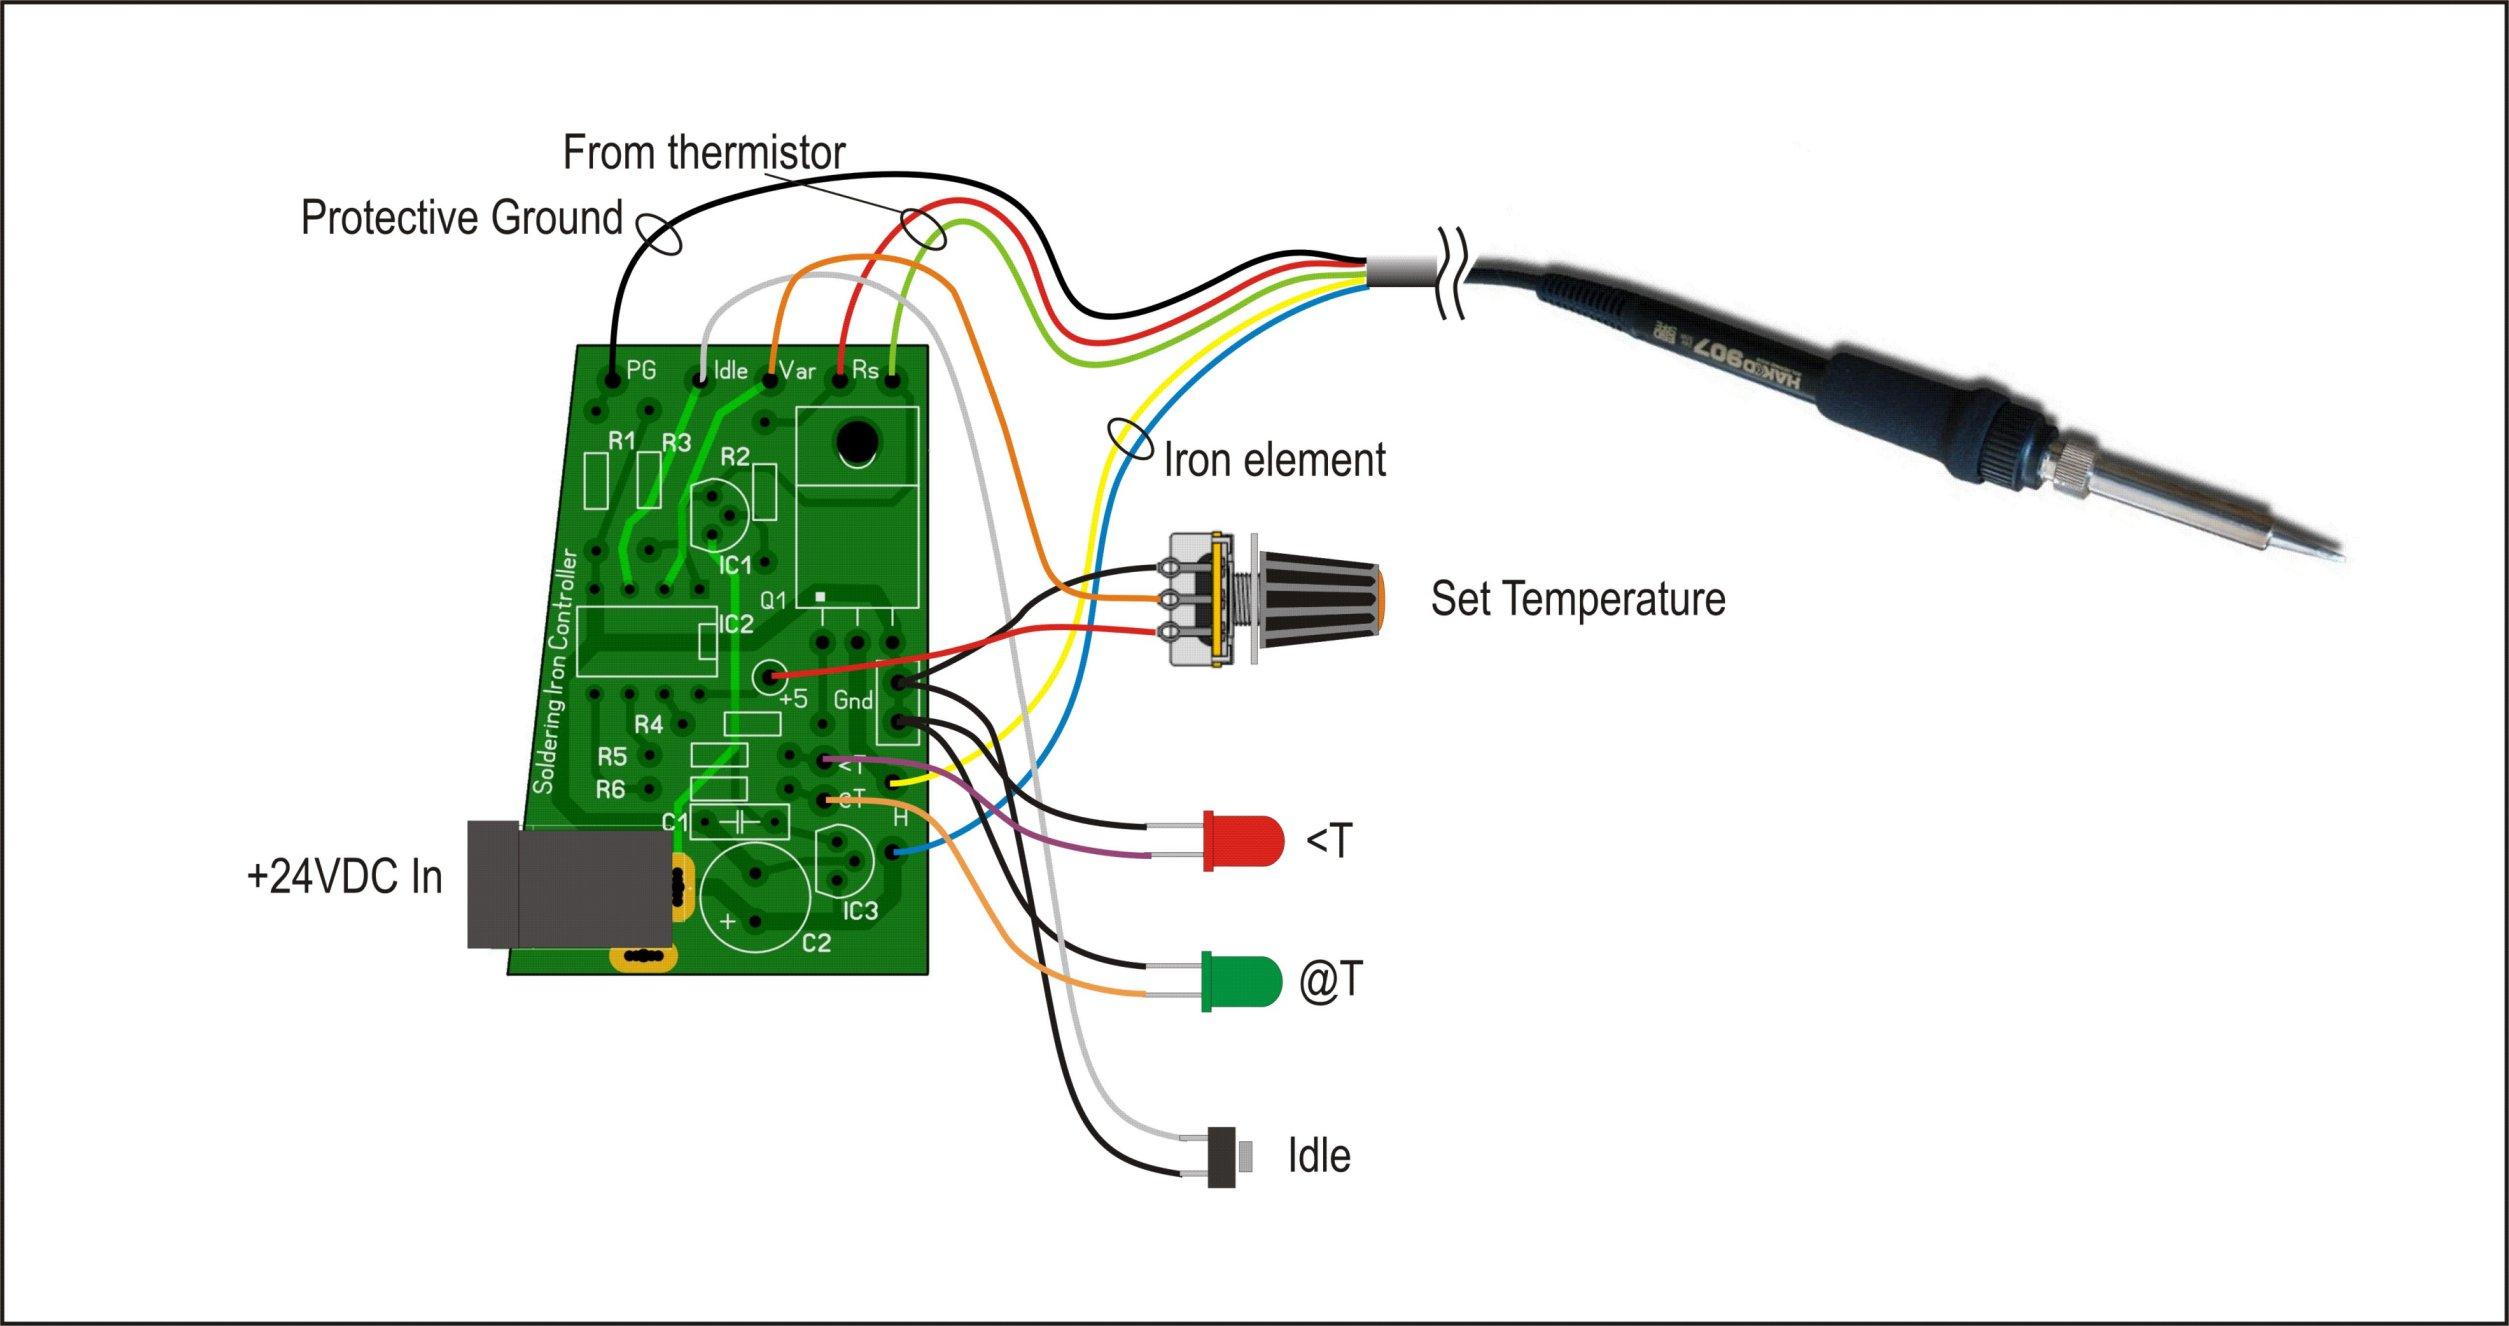 soldering iron wiring diagram wastewater treatment plant schematic zl2pd station saga